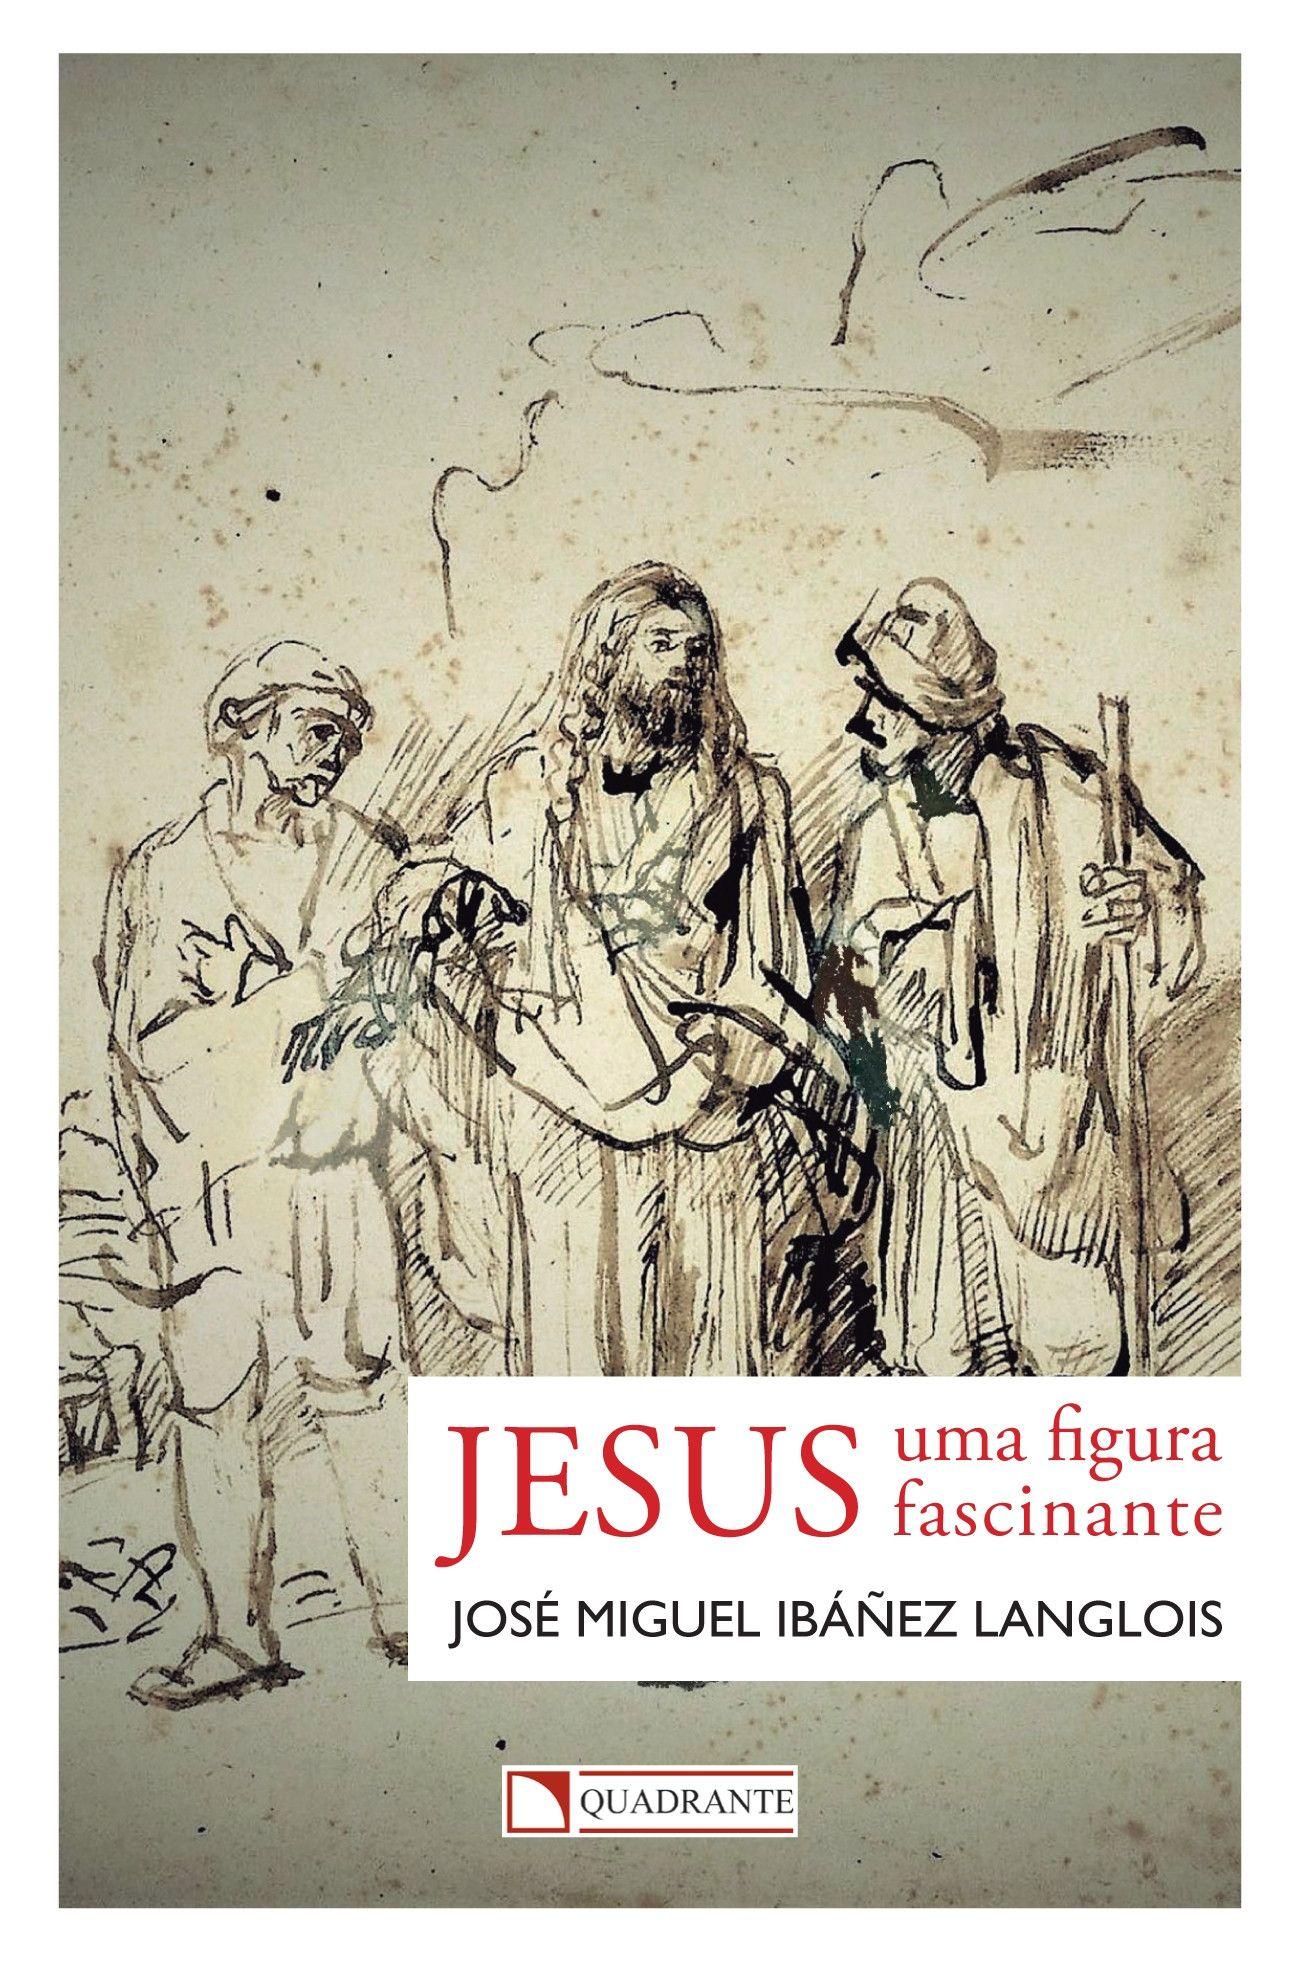 Livro Jesus: uma figura fascinante